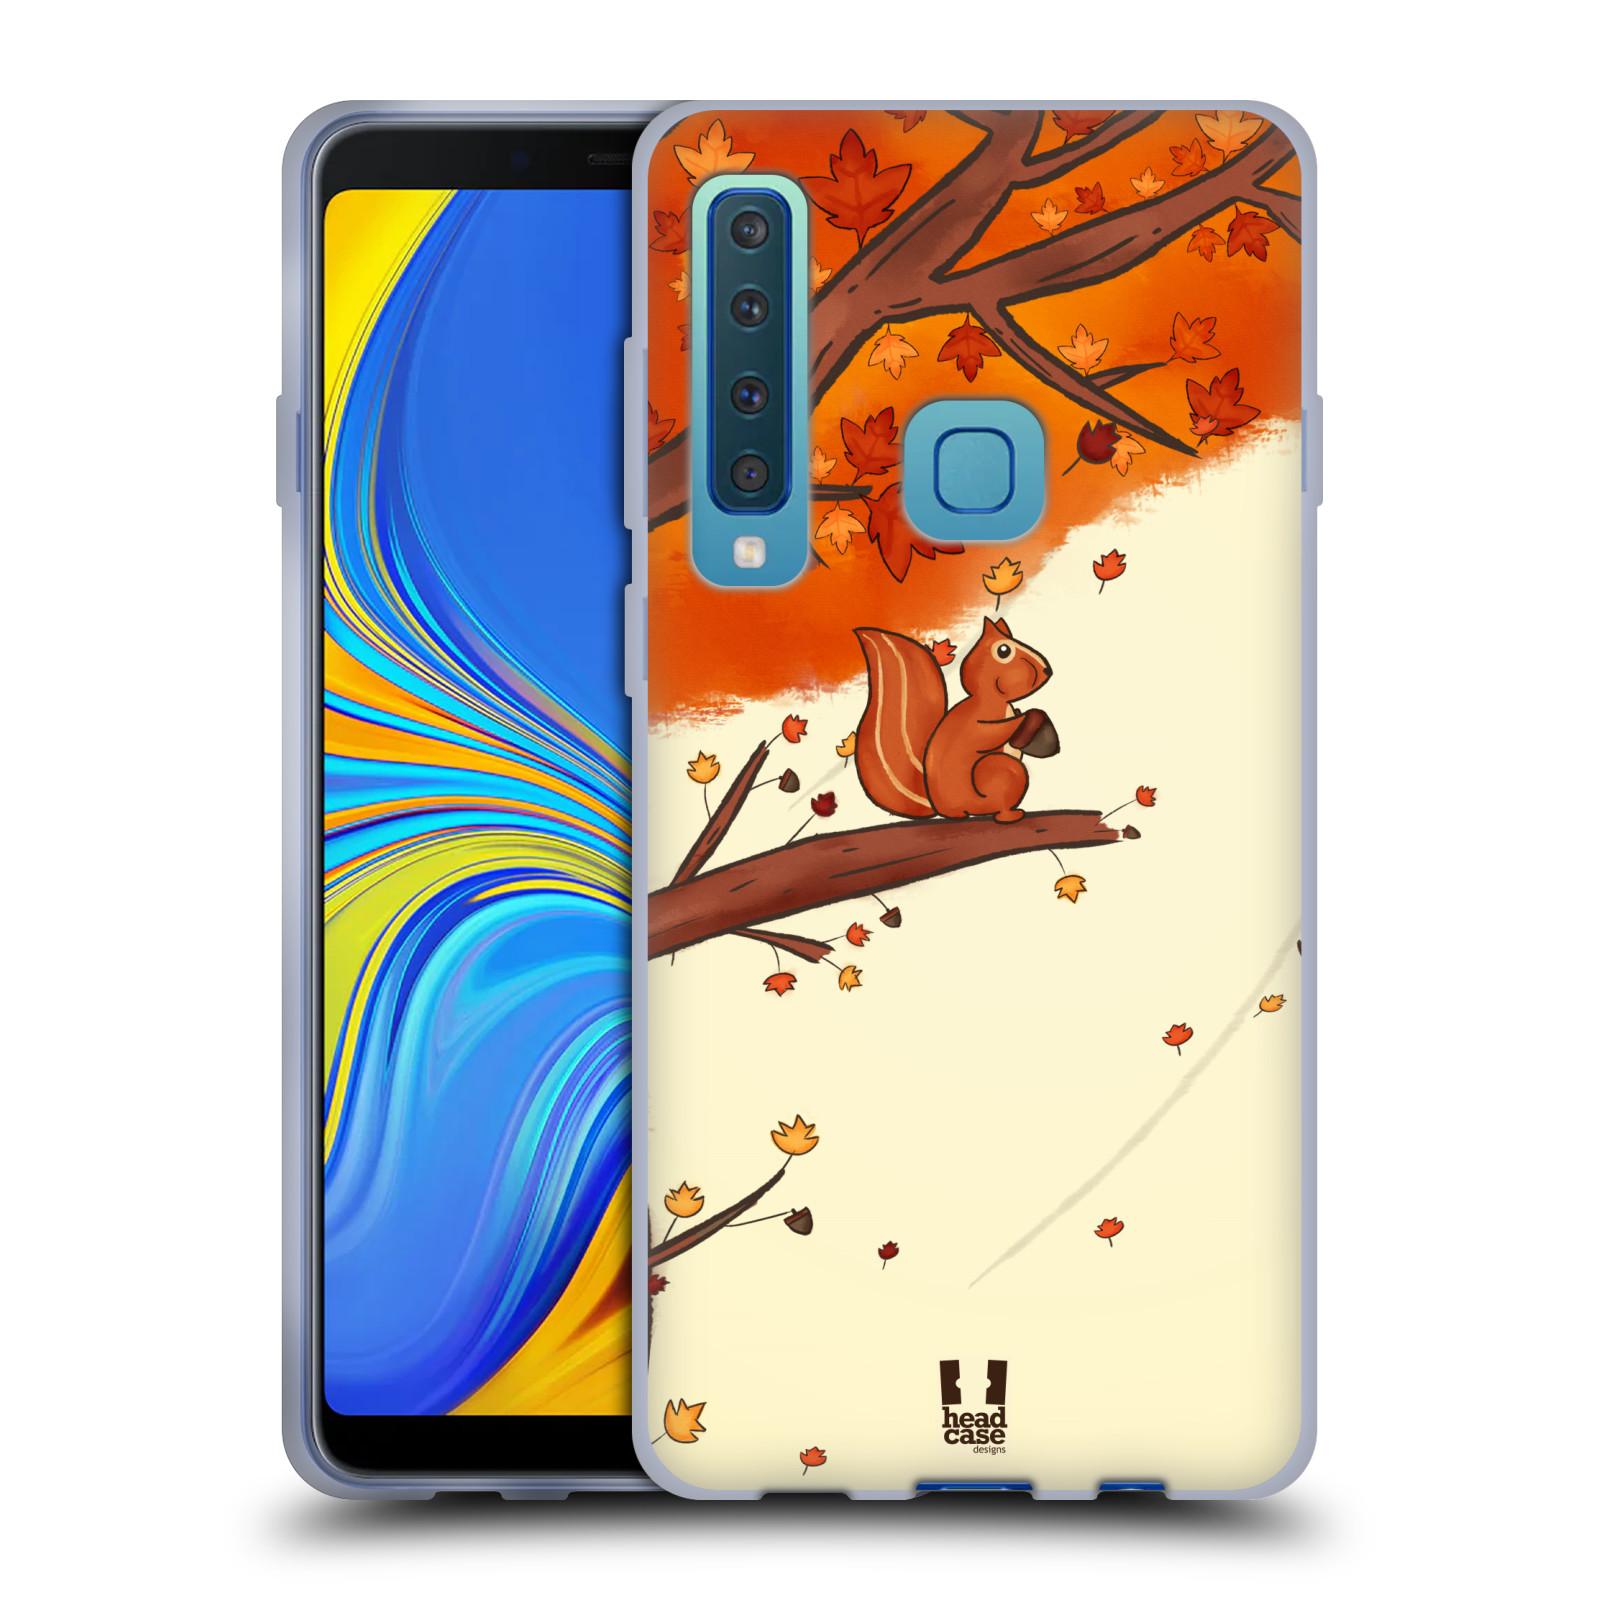 Silikonové pouzdro na mobil Samsung Galaxy A9 (2018) - Head Case - PODZIMNÍ VEVERKA